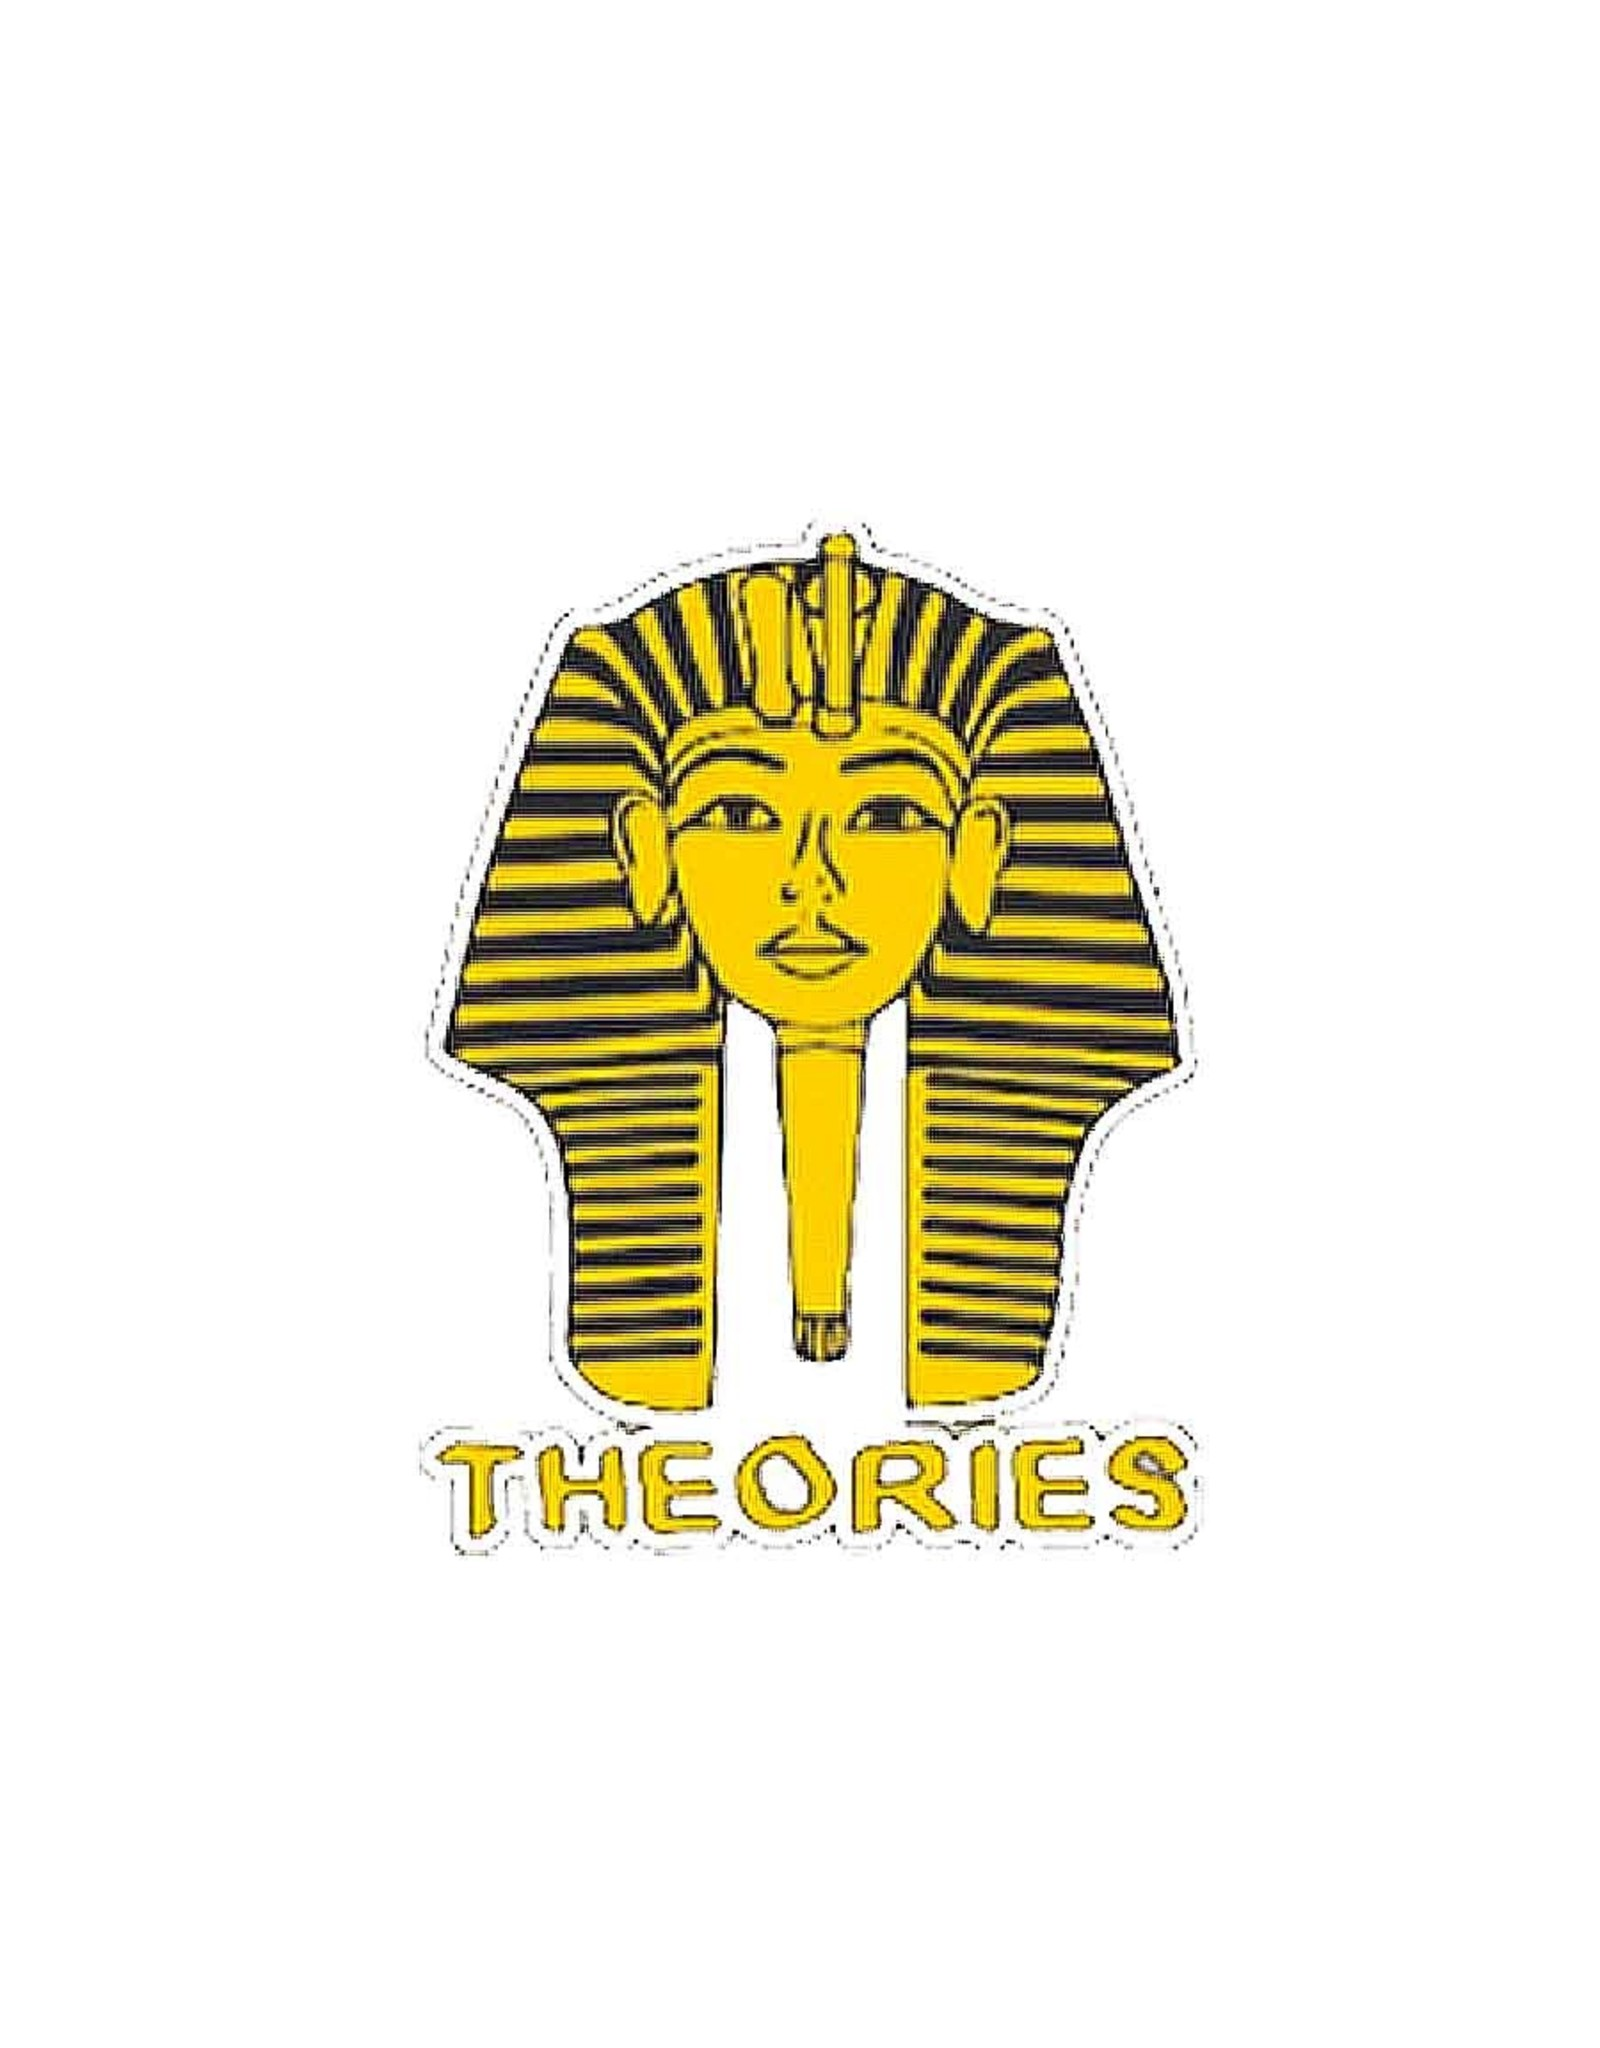 Theories Of Atlantis Theories Sticker Pharoah